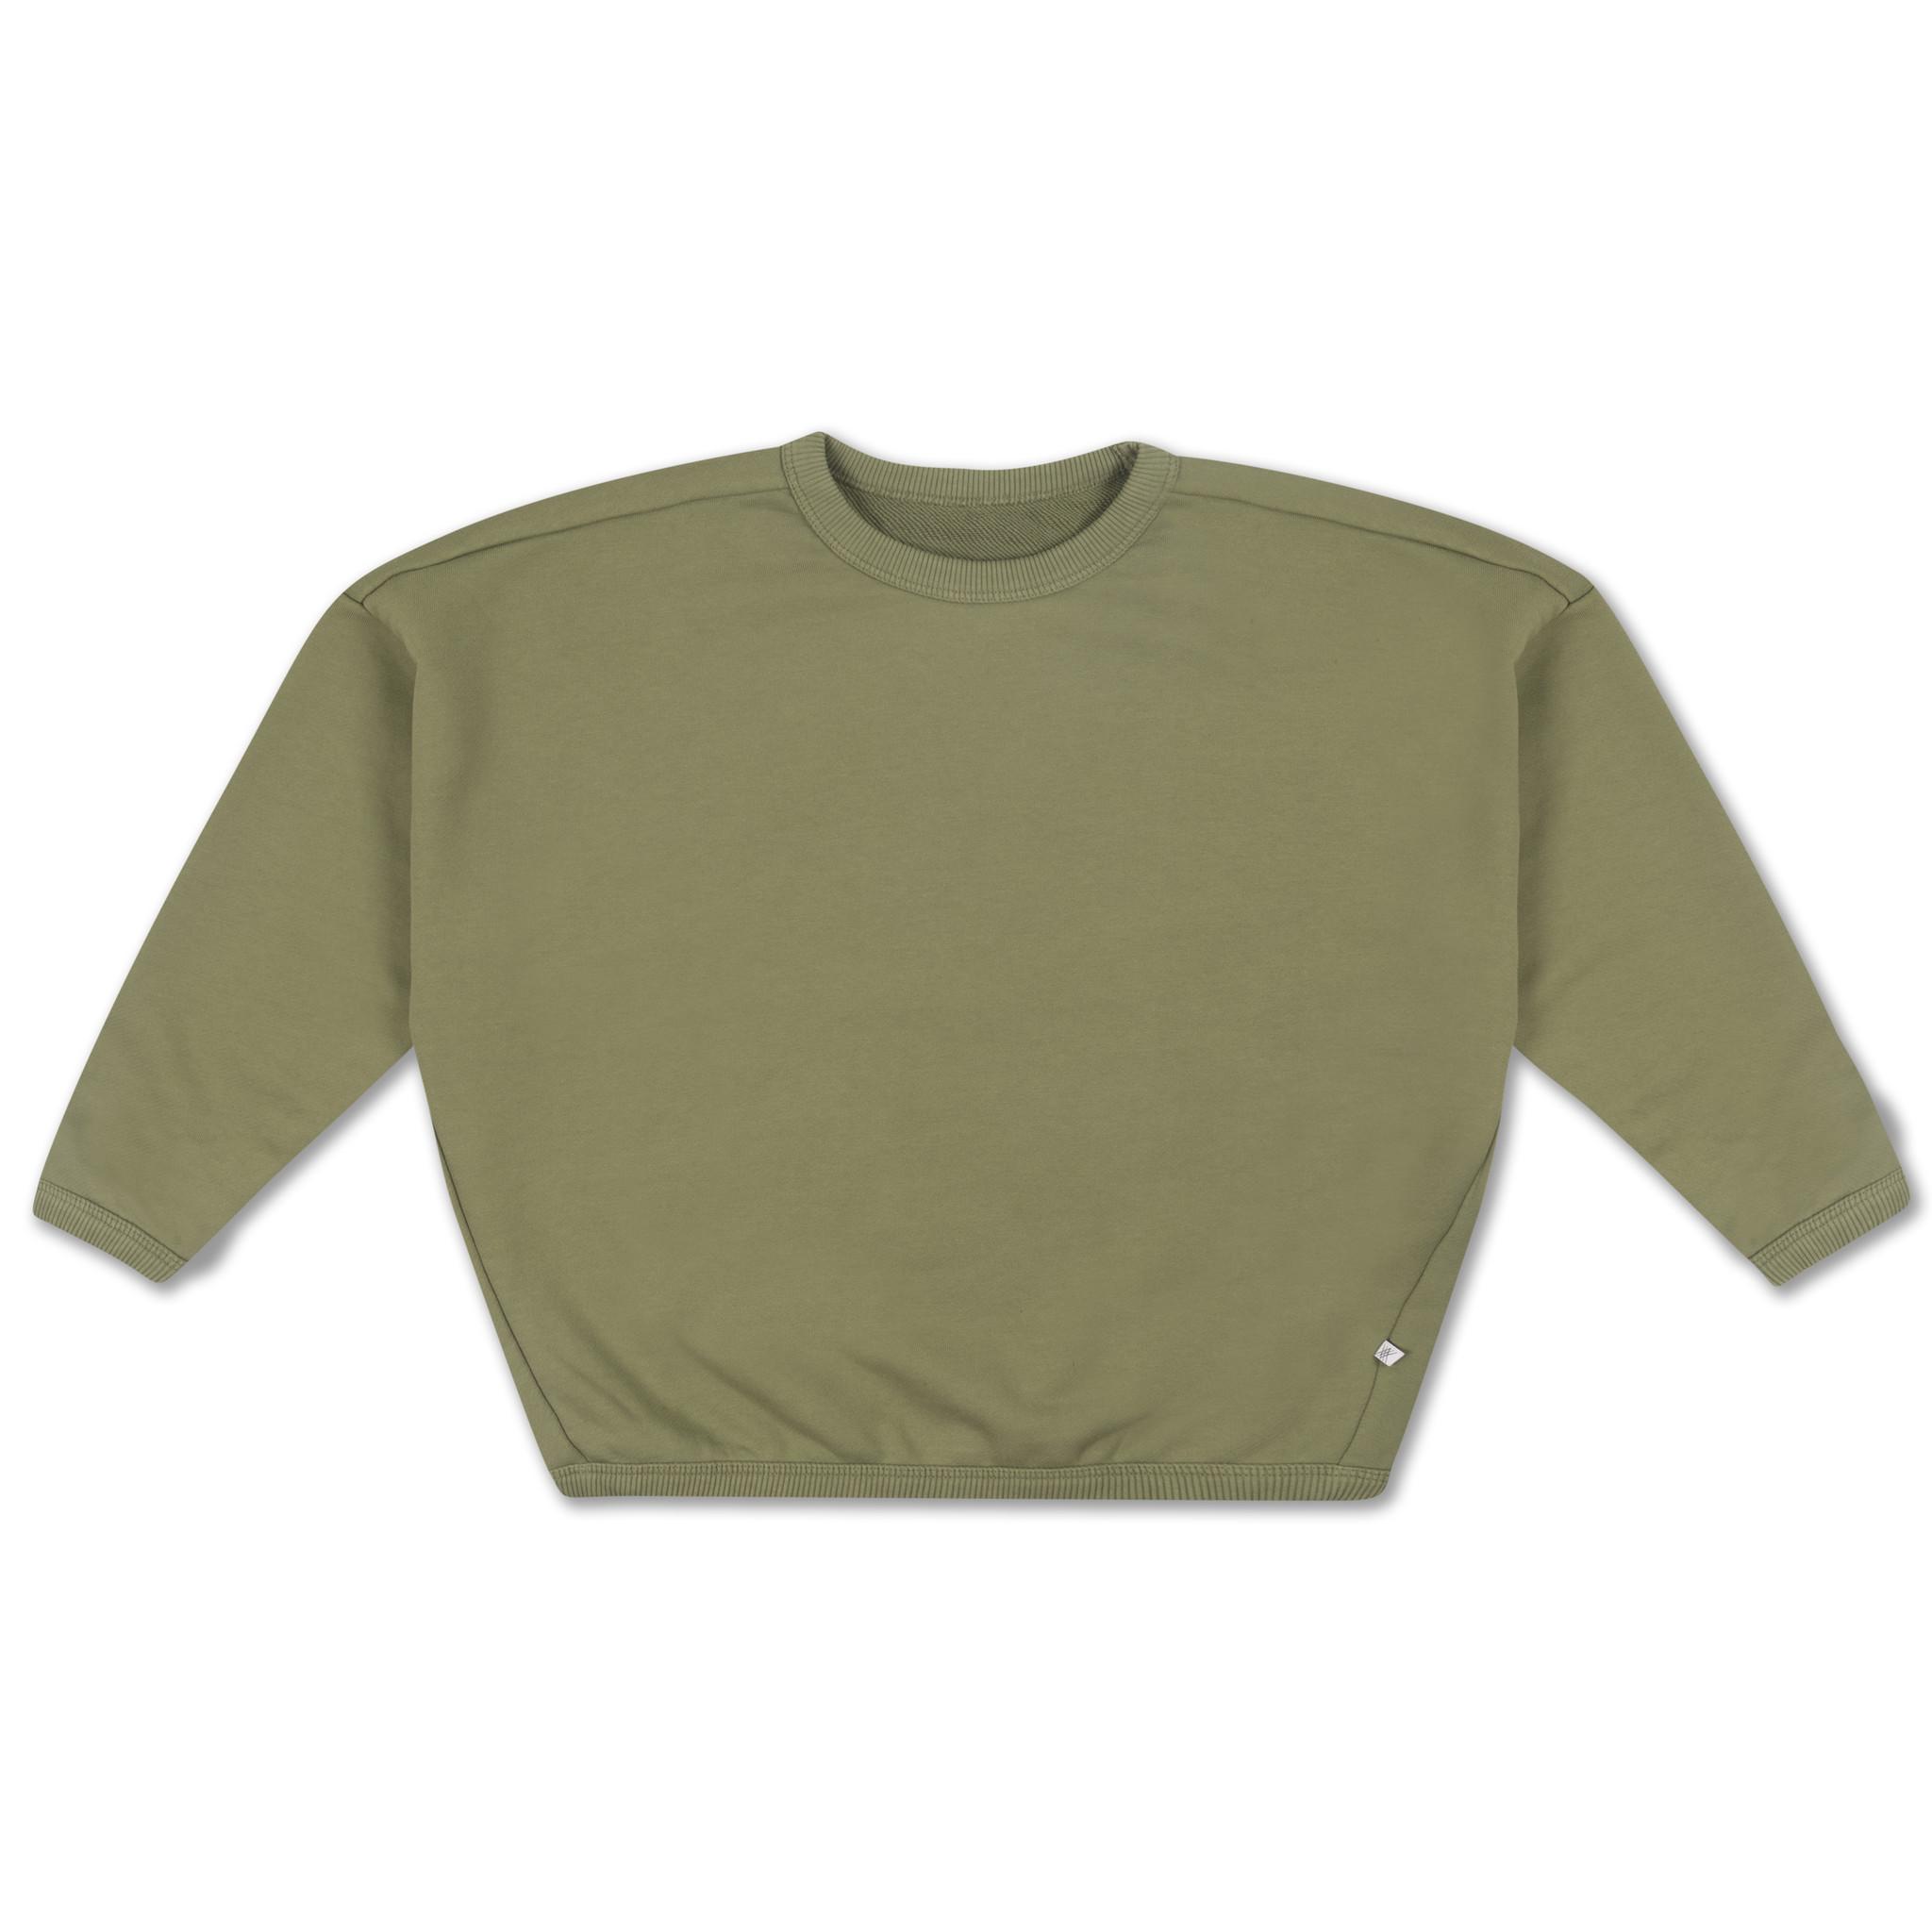 Boxy sweater - Loden Green-1